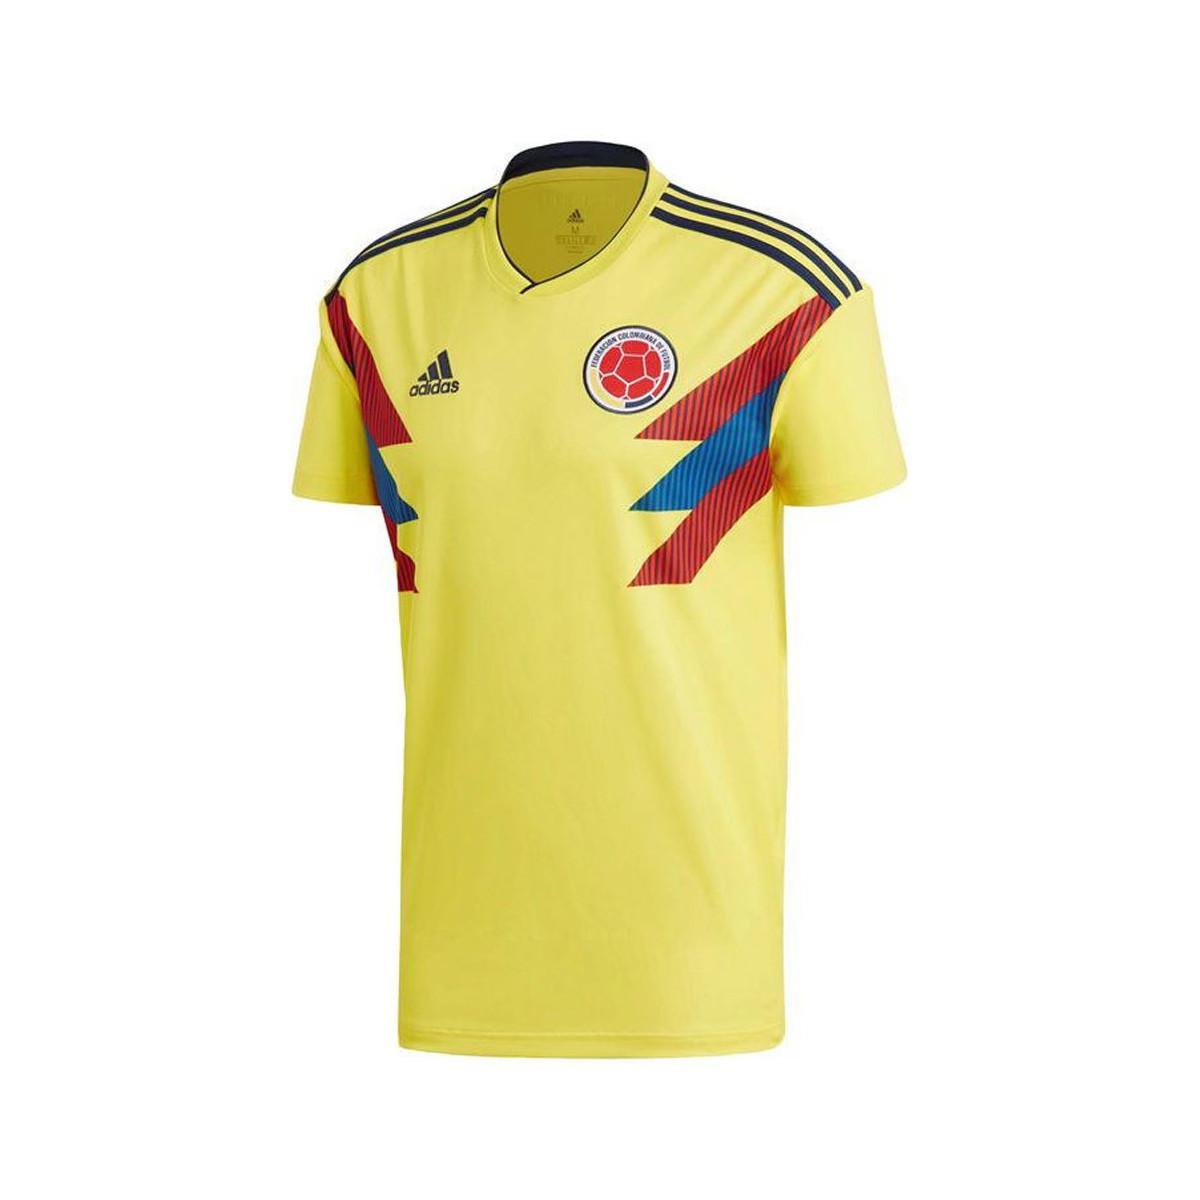 c6c0bbd4f6e Adidas - 2018-2019 Colombia Home Football Shirt Women s T Shirt In Yellow  for Men. View fullscreen